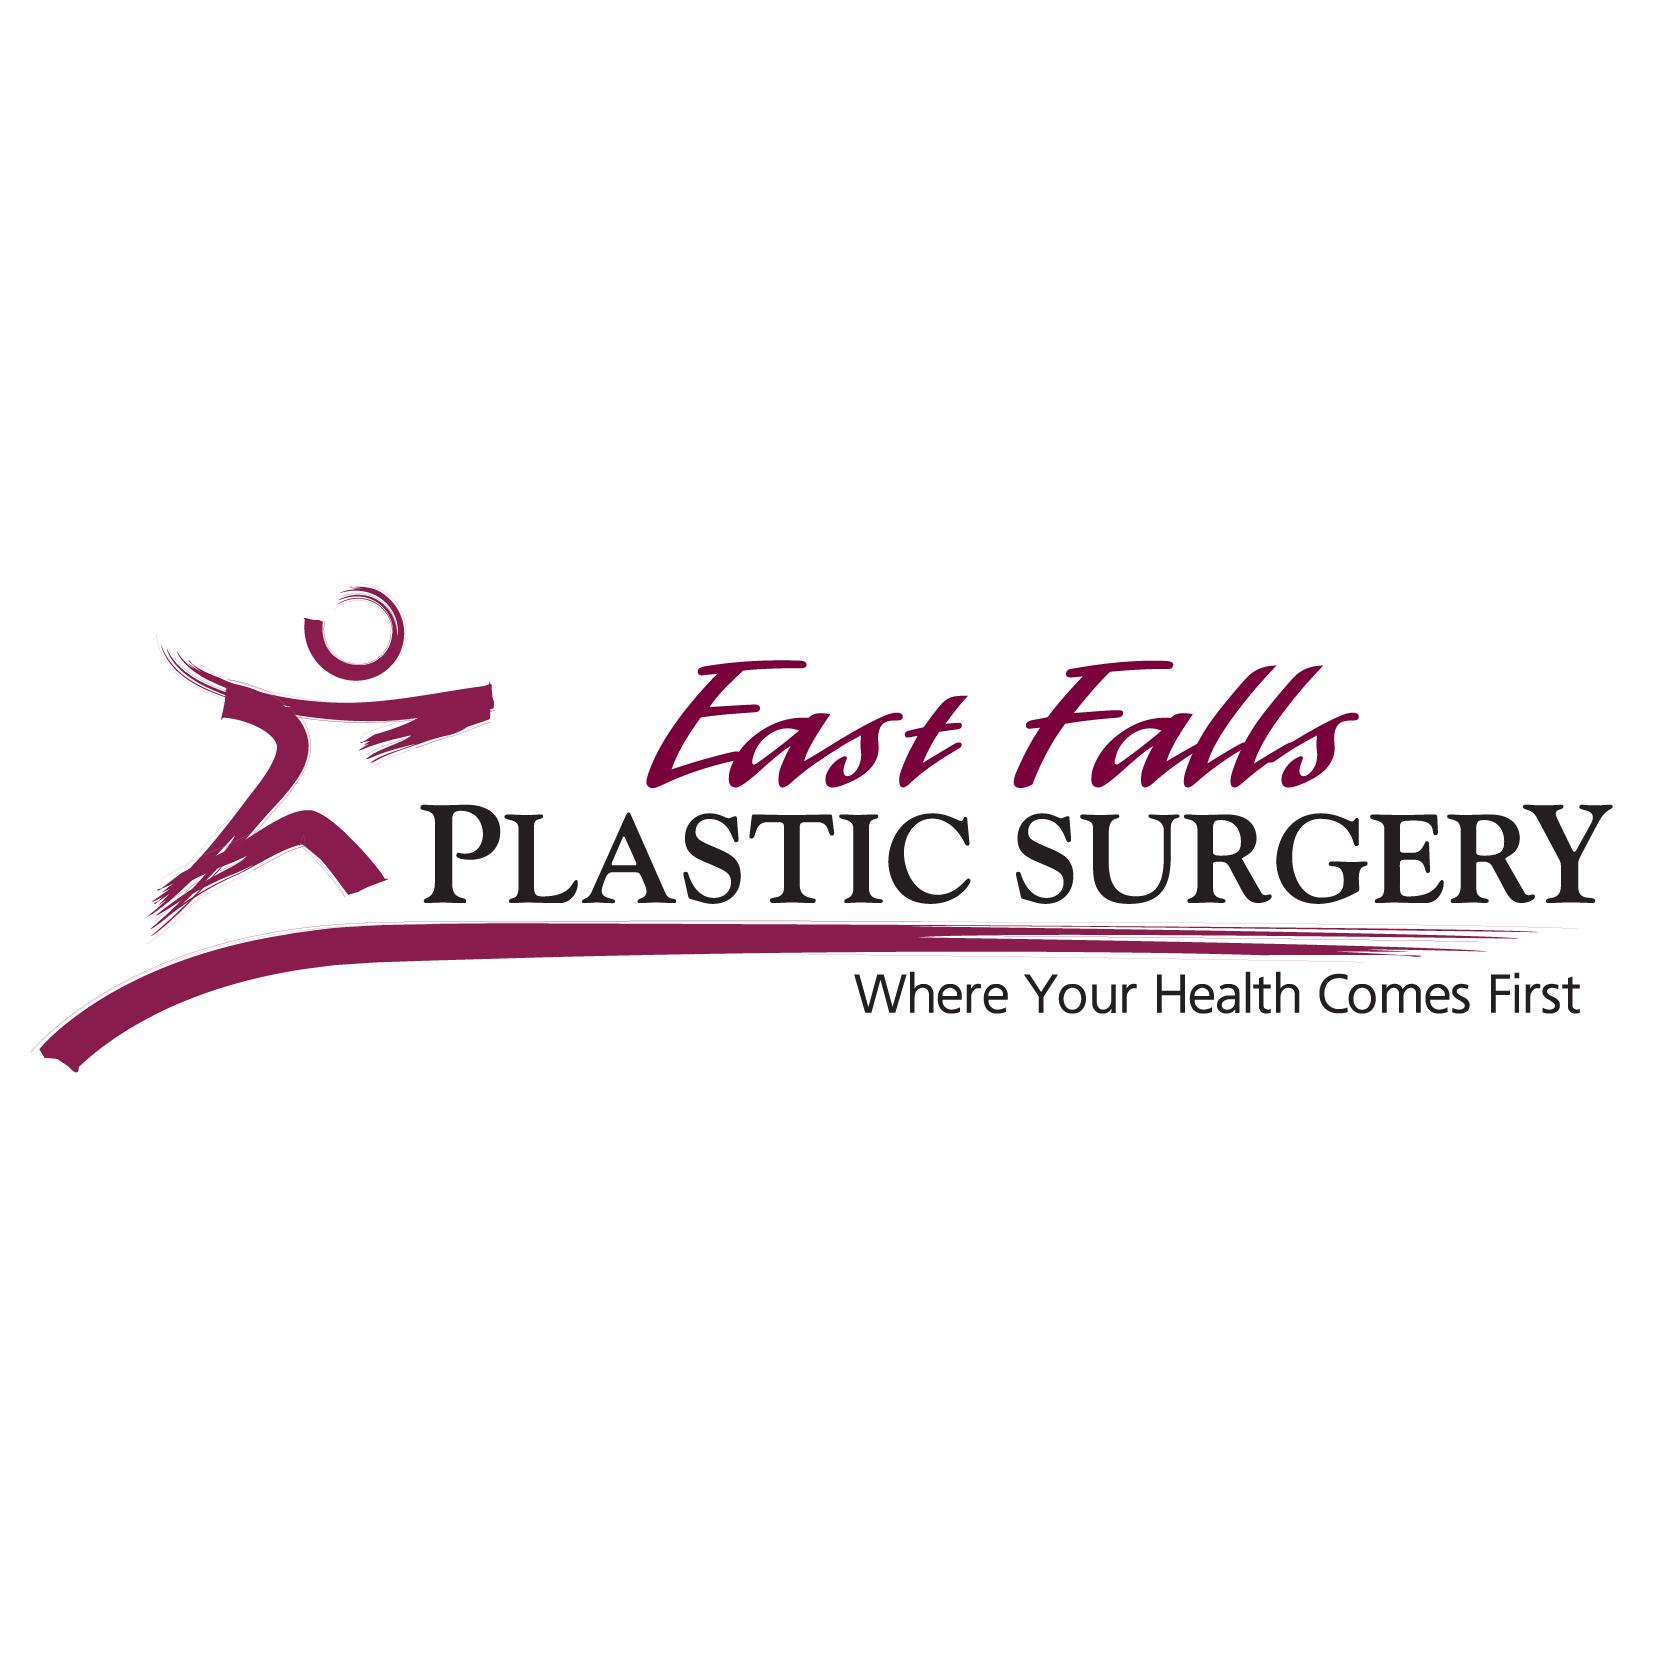 East Falls Plastic Surgery